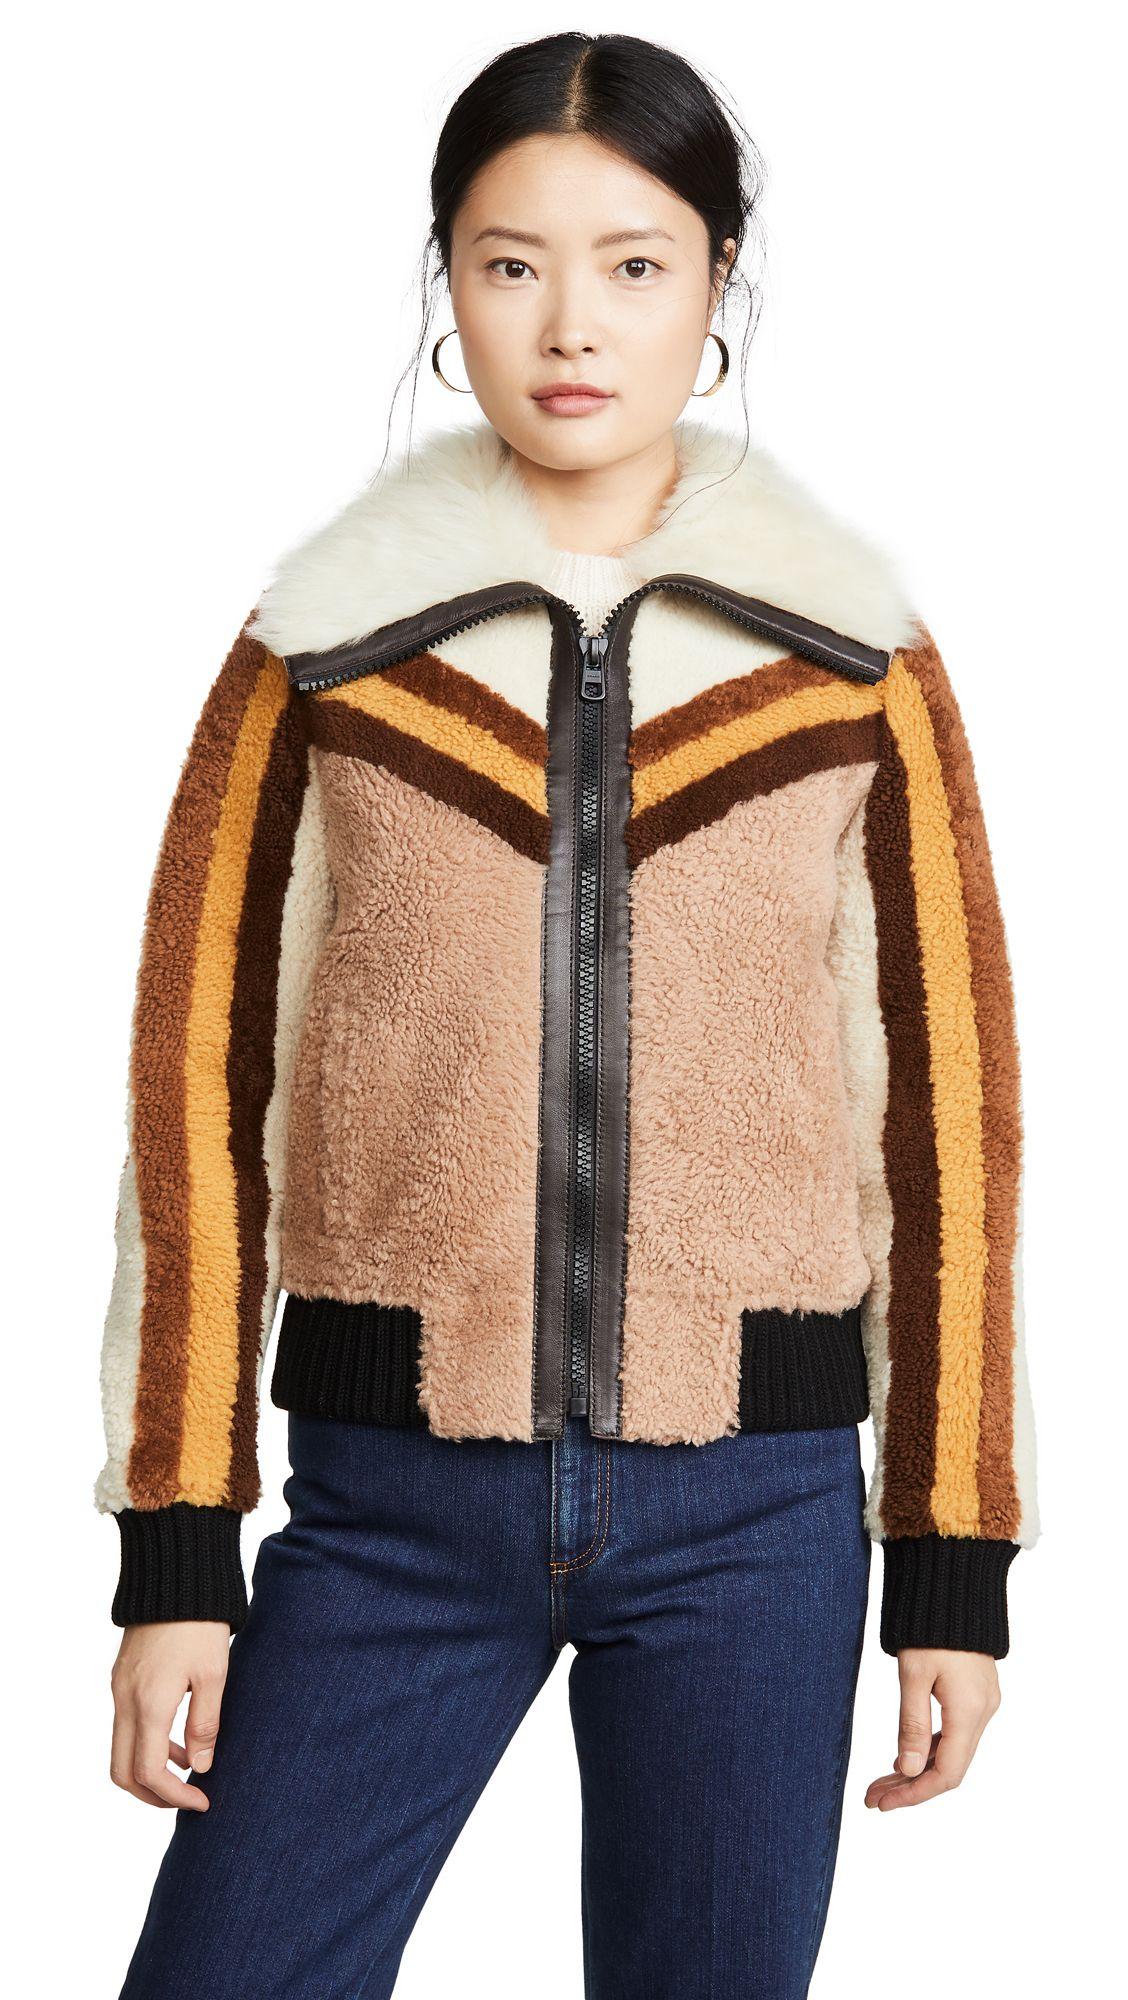 Coach 1941 Shearling Bomber Jacket Coach Cloth Bomber Jacket Shearling Jackets [ 2000 x 1128 Pixel ]